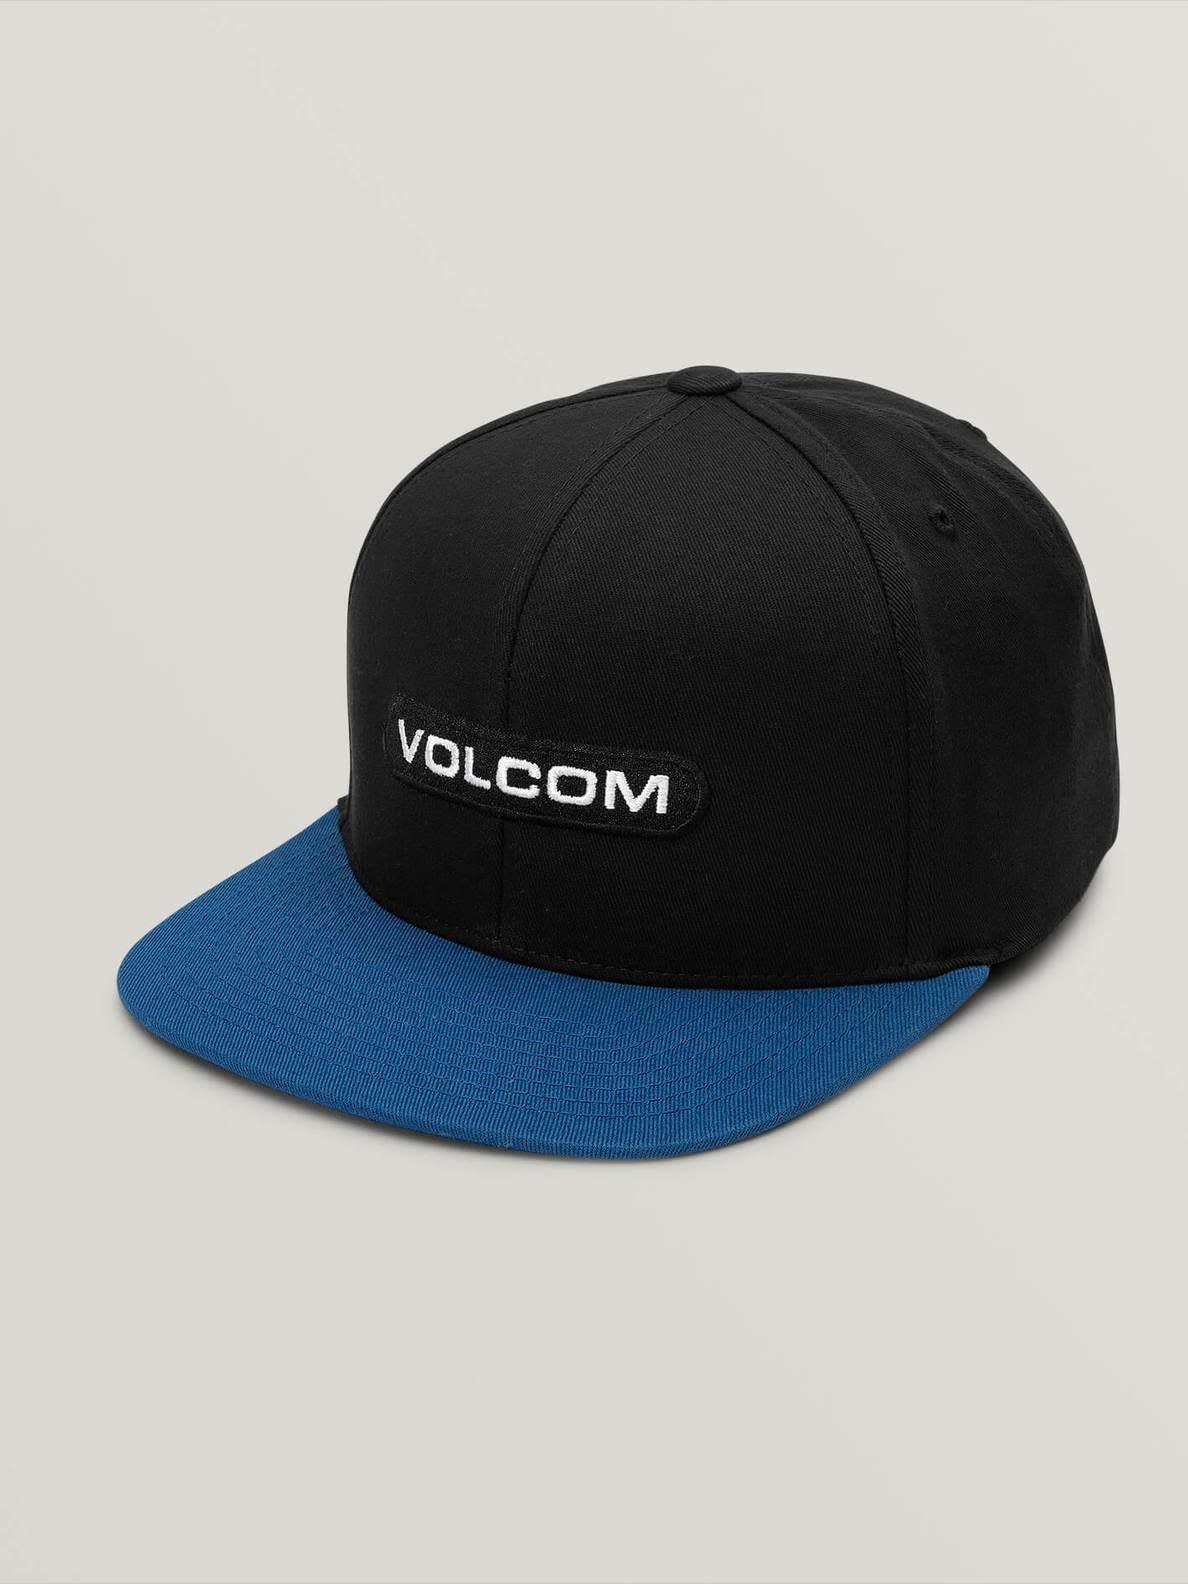 Volcom Volcom Euro 110 Snapback Hat - Deep Water